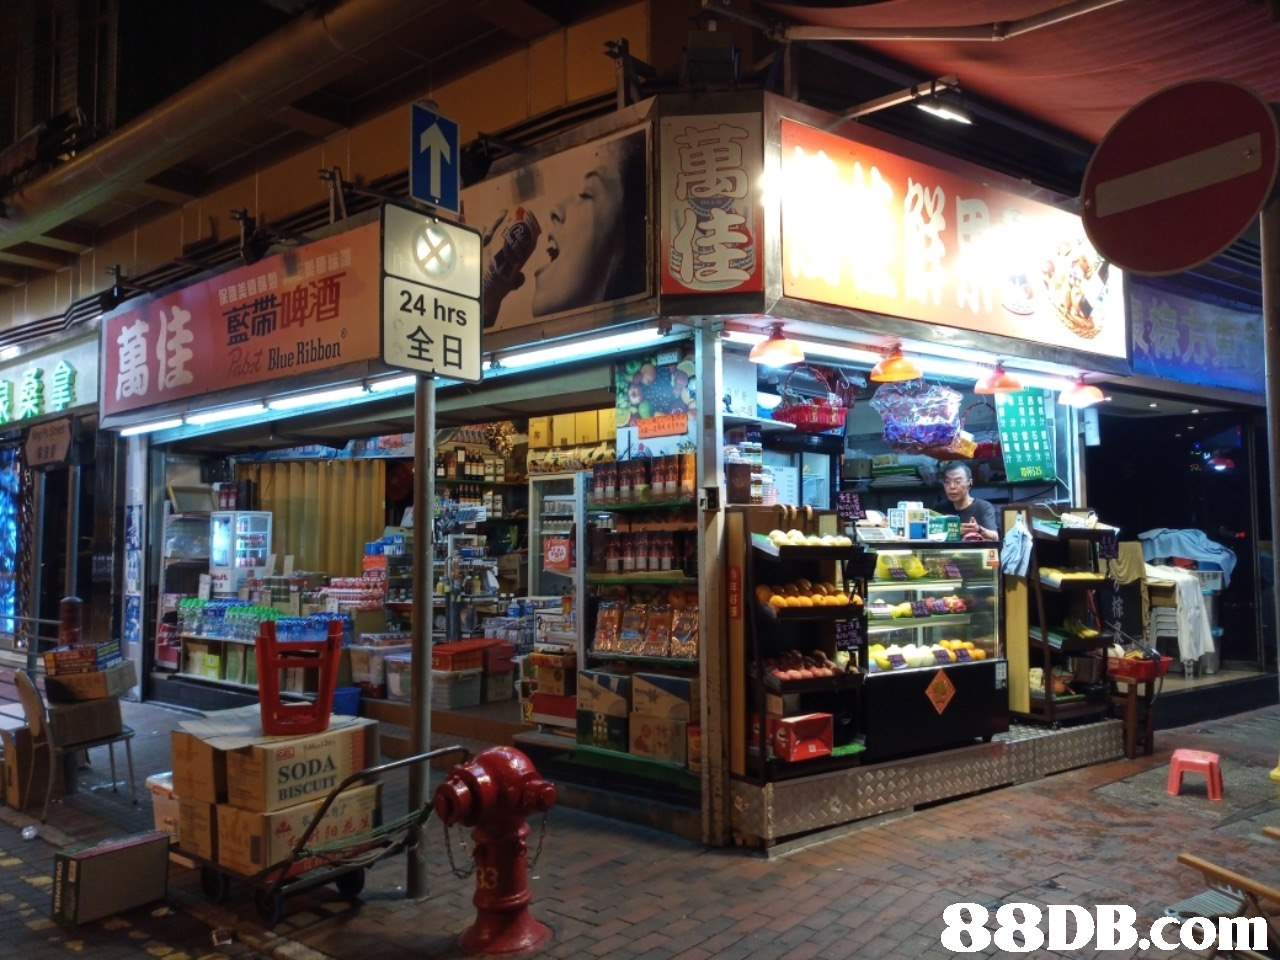 Bue Ribon i2 SODA   Building,Convenience store,Retail,Marketplace,Market